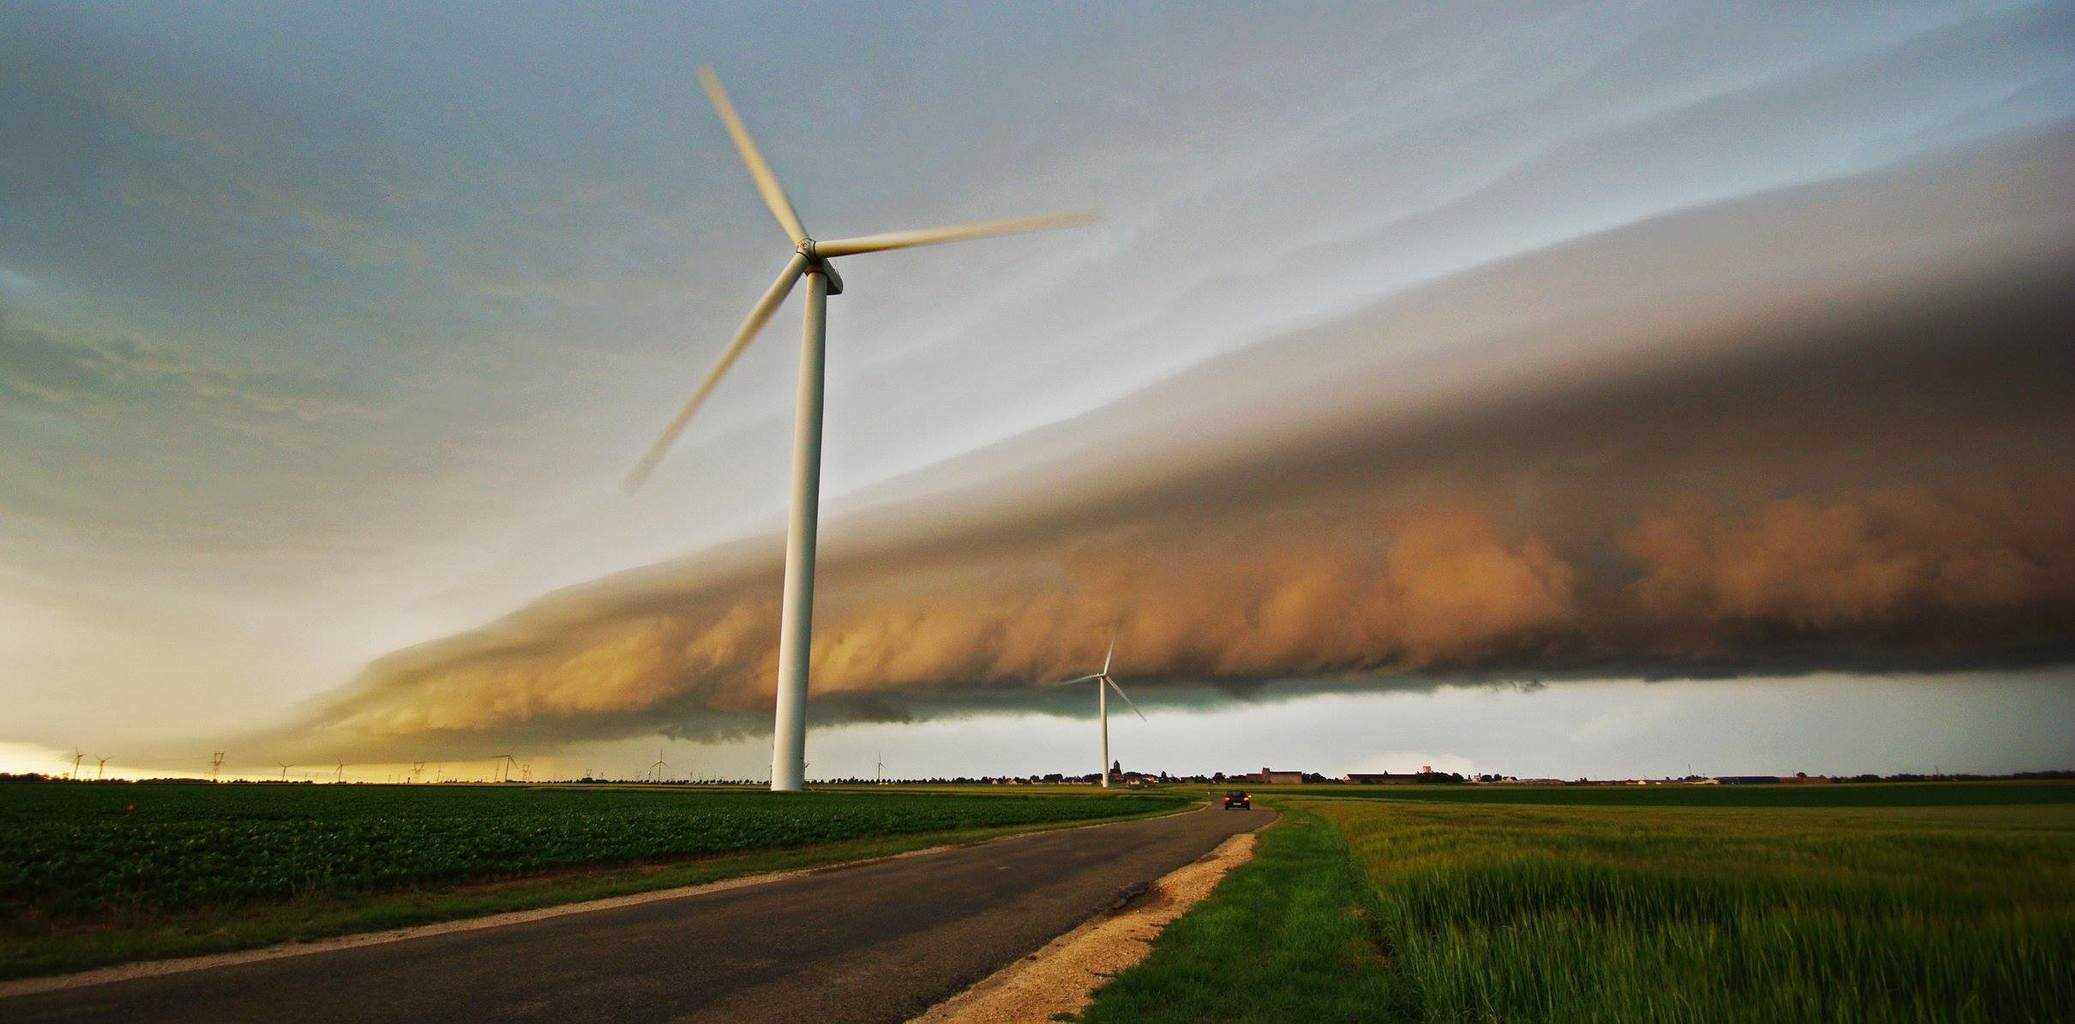 Massive shelfcloud, 17th june 2013, central plains of France.